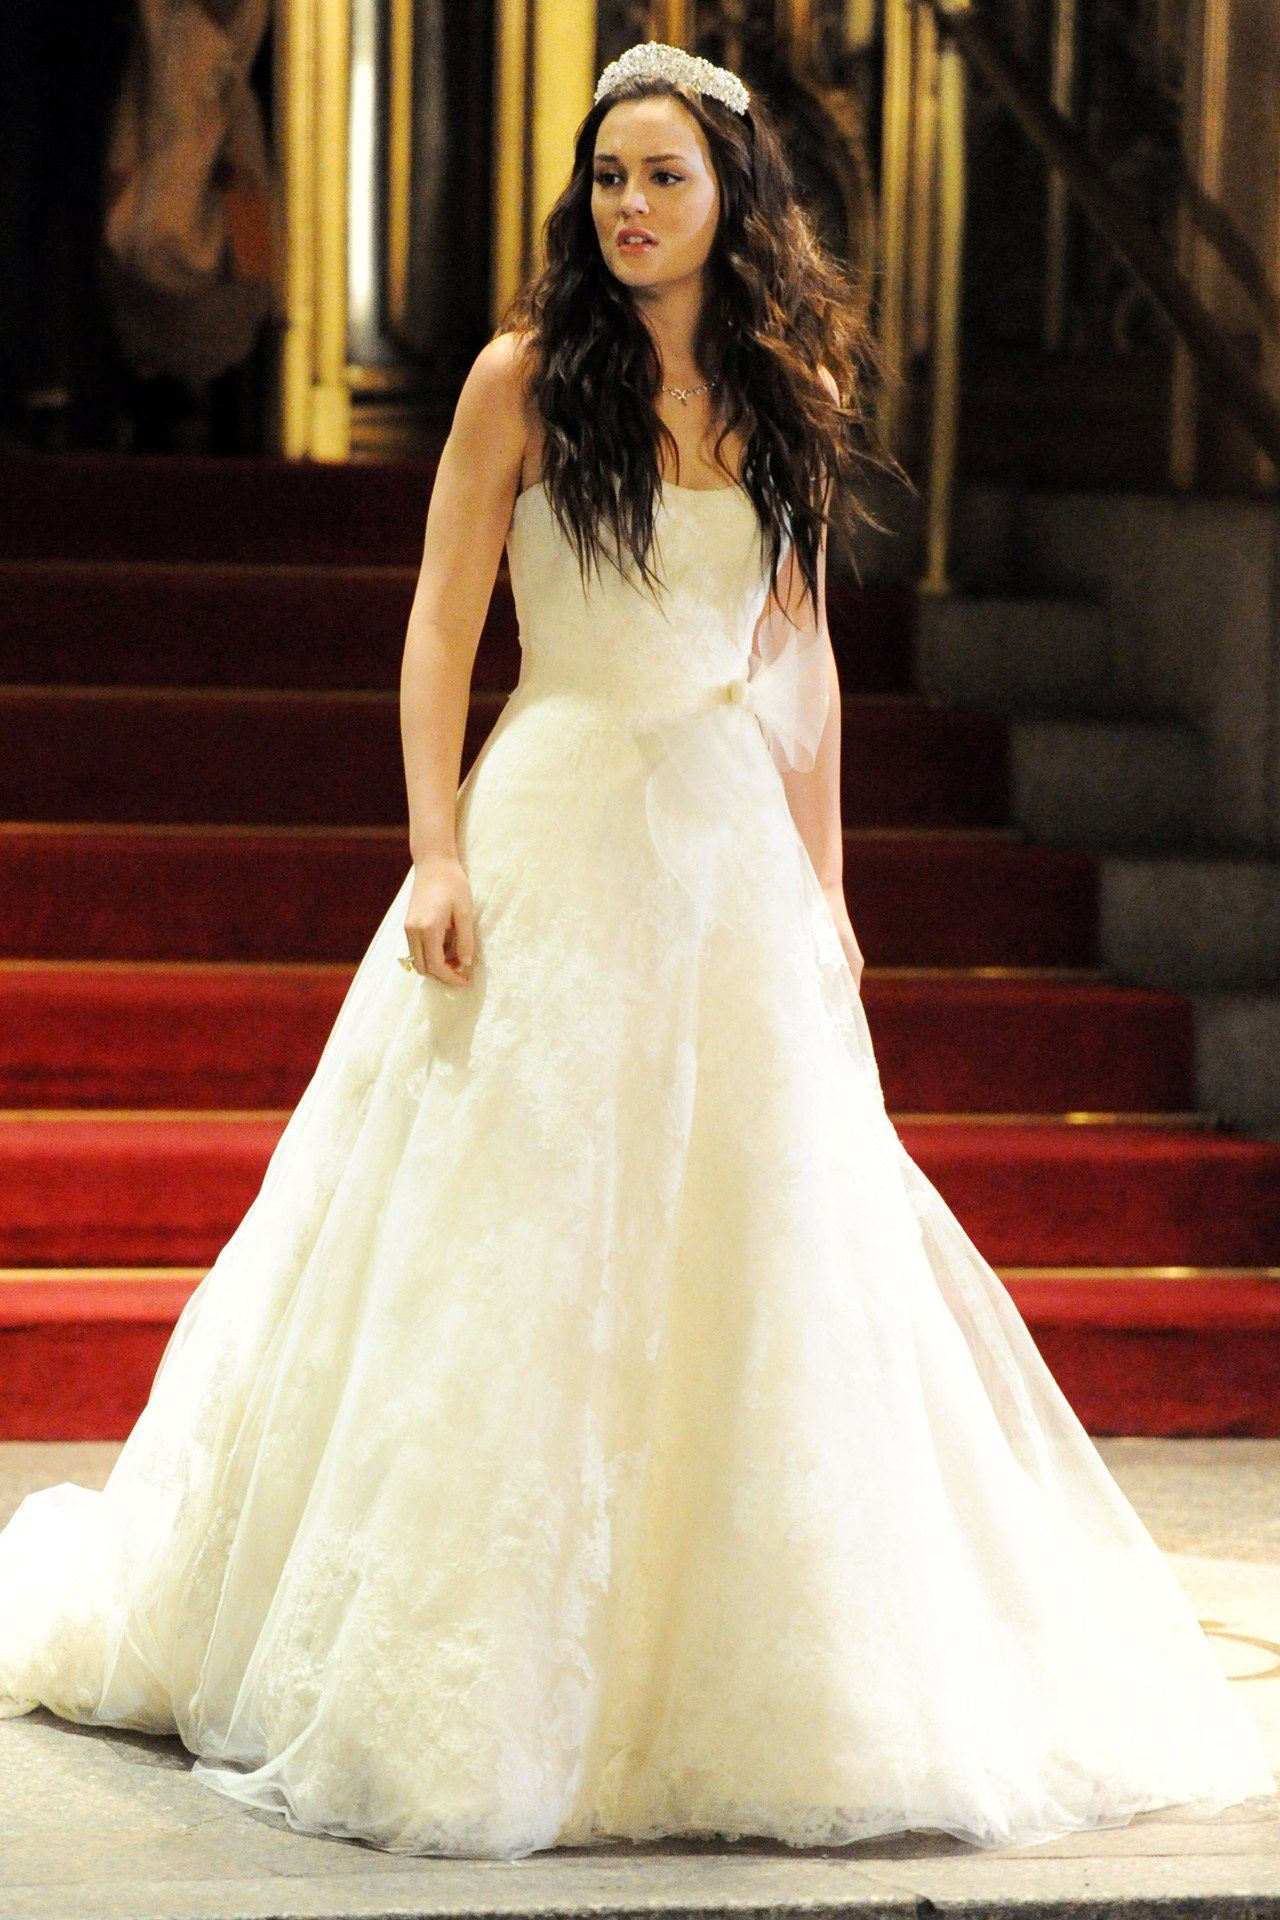 blair waldorf wedding dress | Elbiseler | Pinterest | Blair waldorf ...